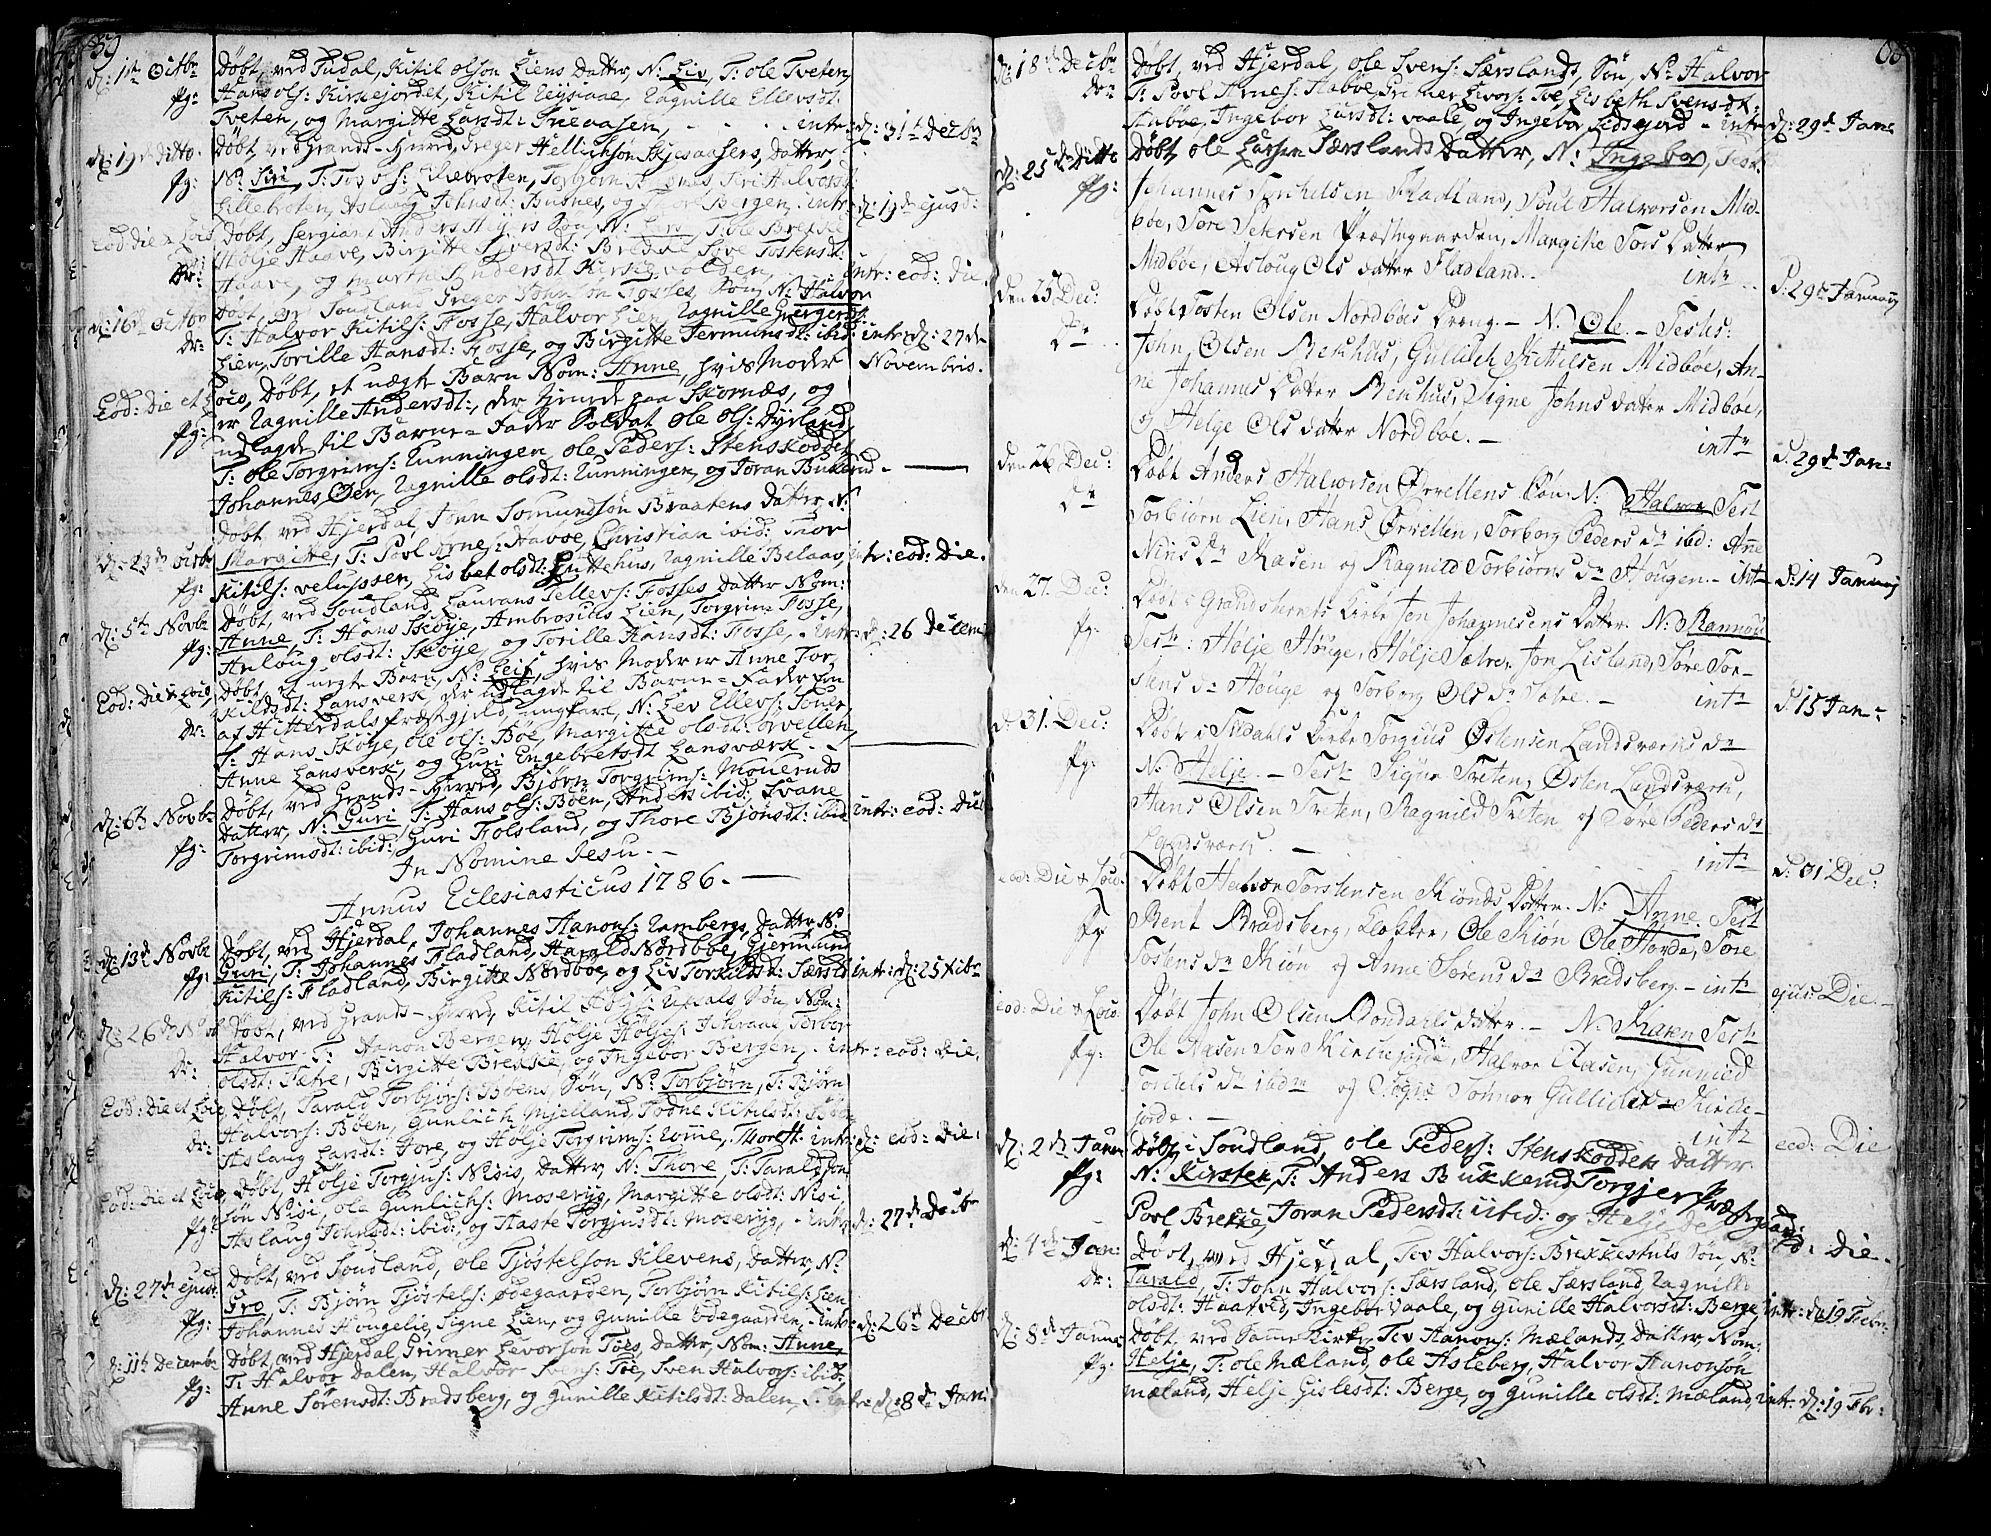 SAKO, Hjartdal kirkebøker, F/Fa/L0005: Ministerialbok nr. I 5, 1776-1801, s. 59-60